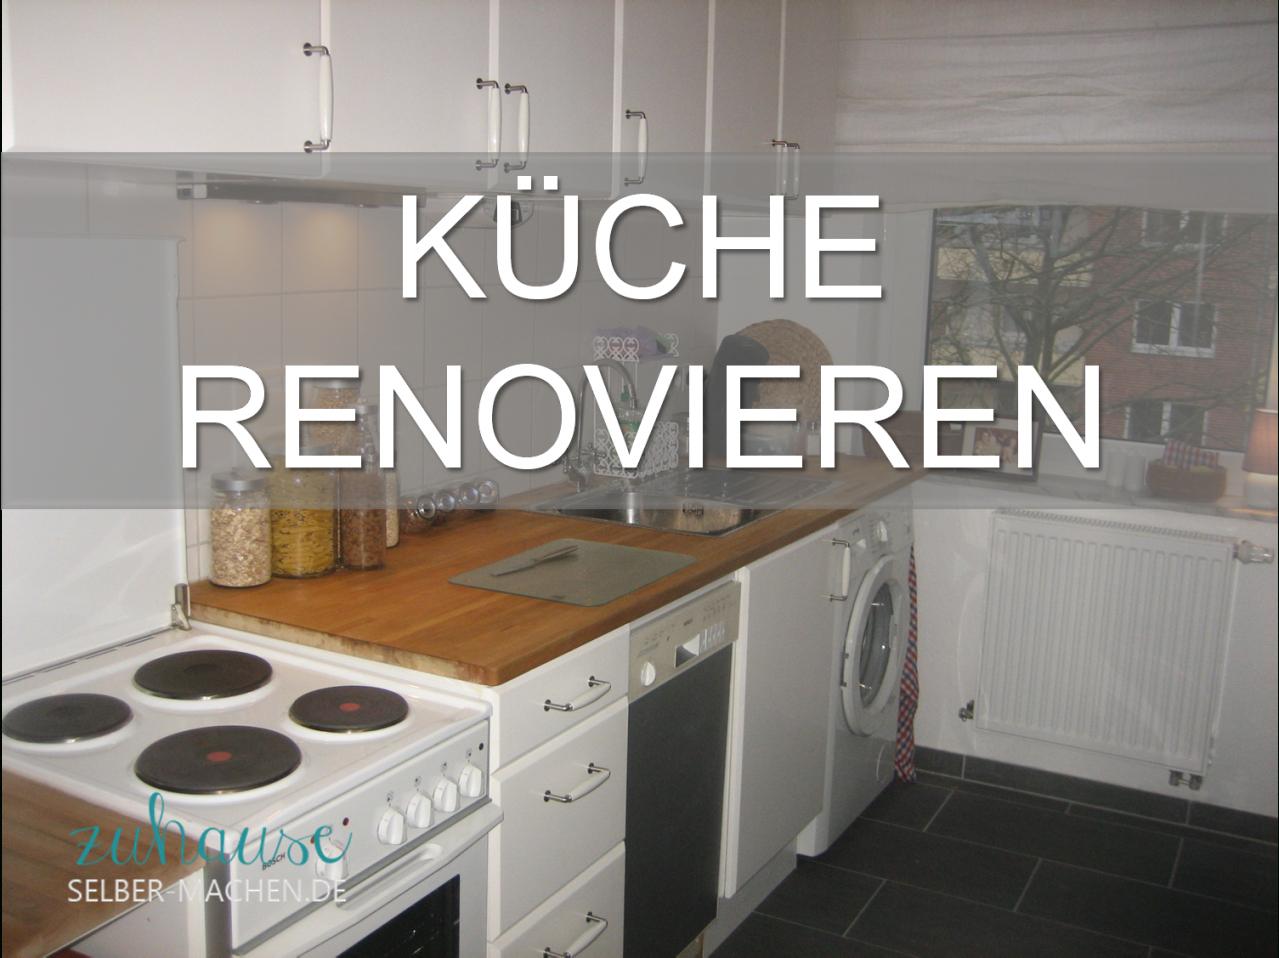 Selber Machen Küche  Imagenesdesalud  Imagenesdesalud von Wanddeko Küche Selber Machen Bild